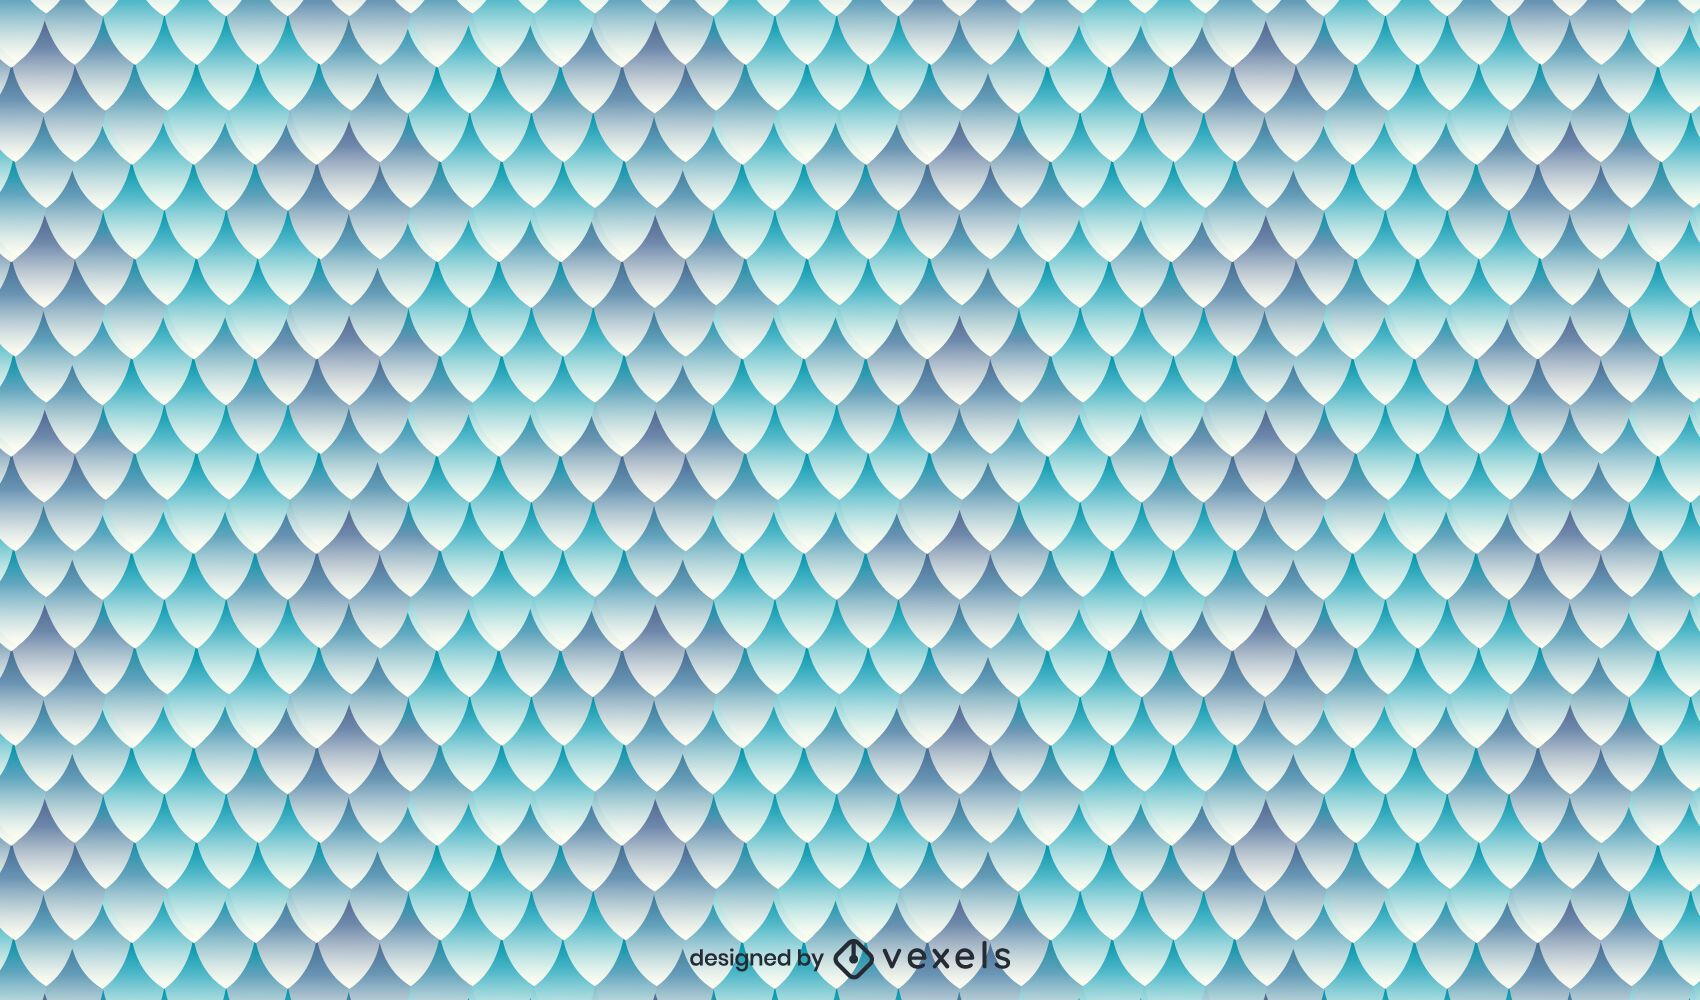 Patrón de textura de escamas de dragón